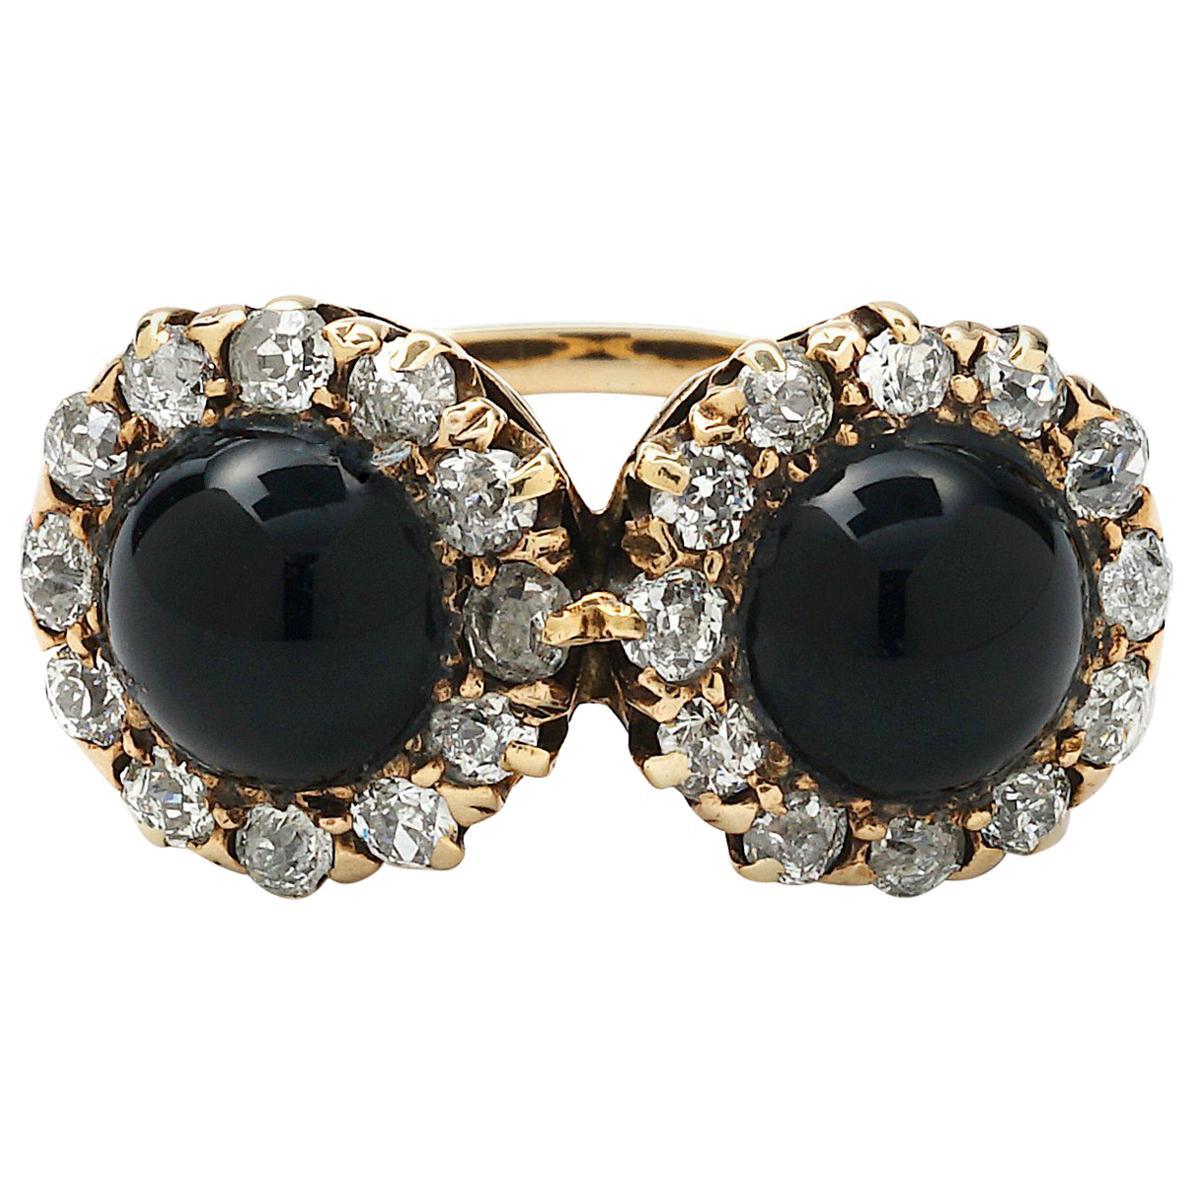 Antique Diamond and Black Onyx Halo Ring